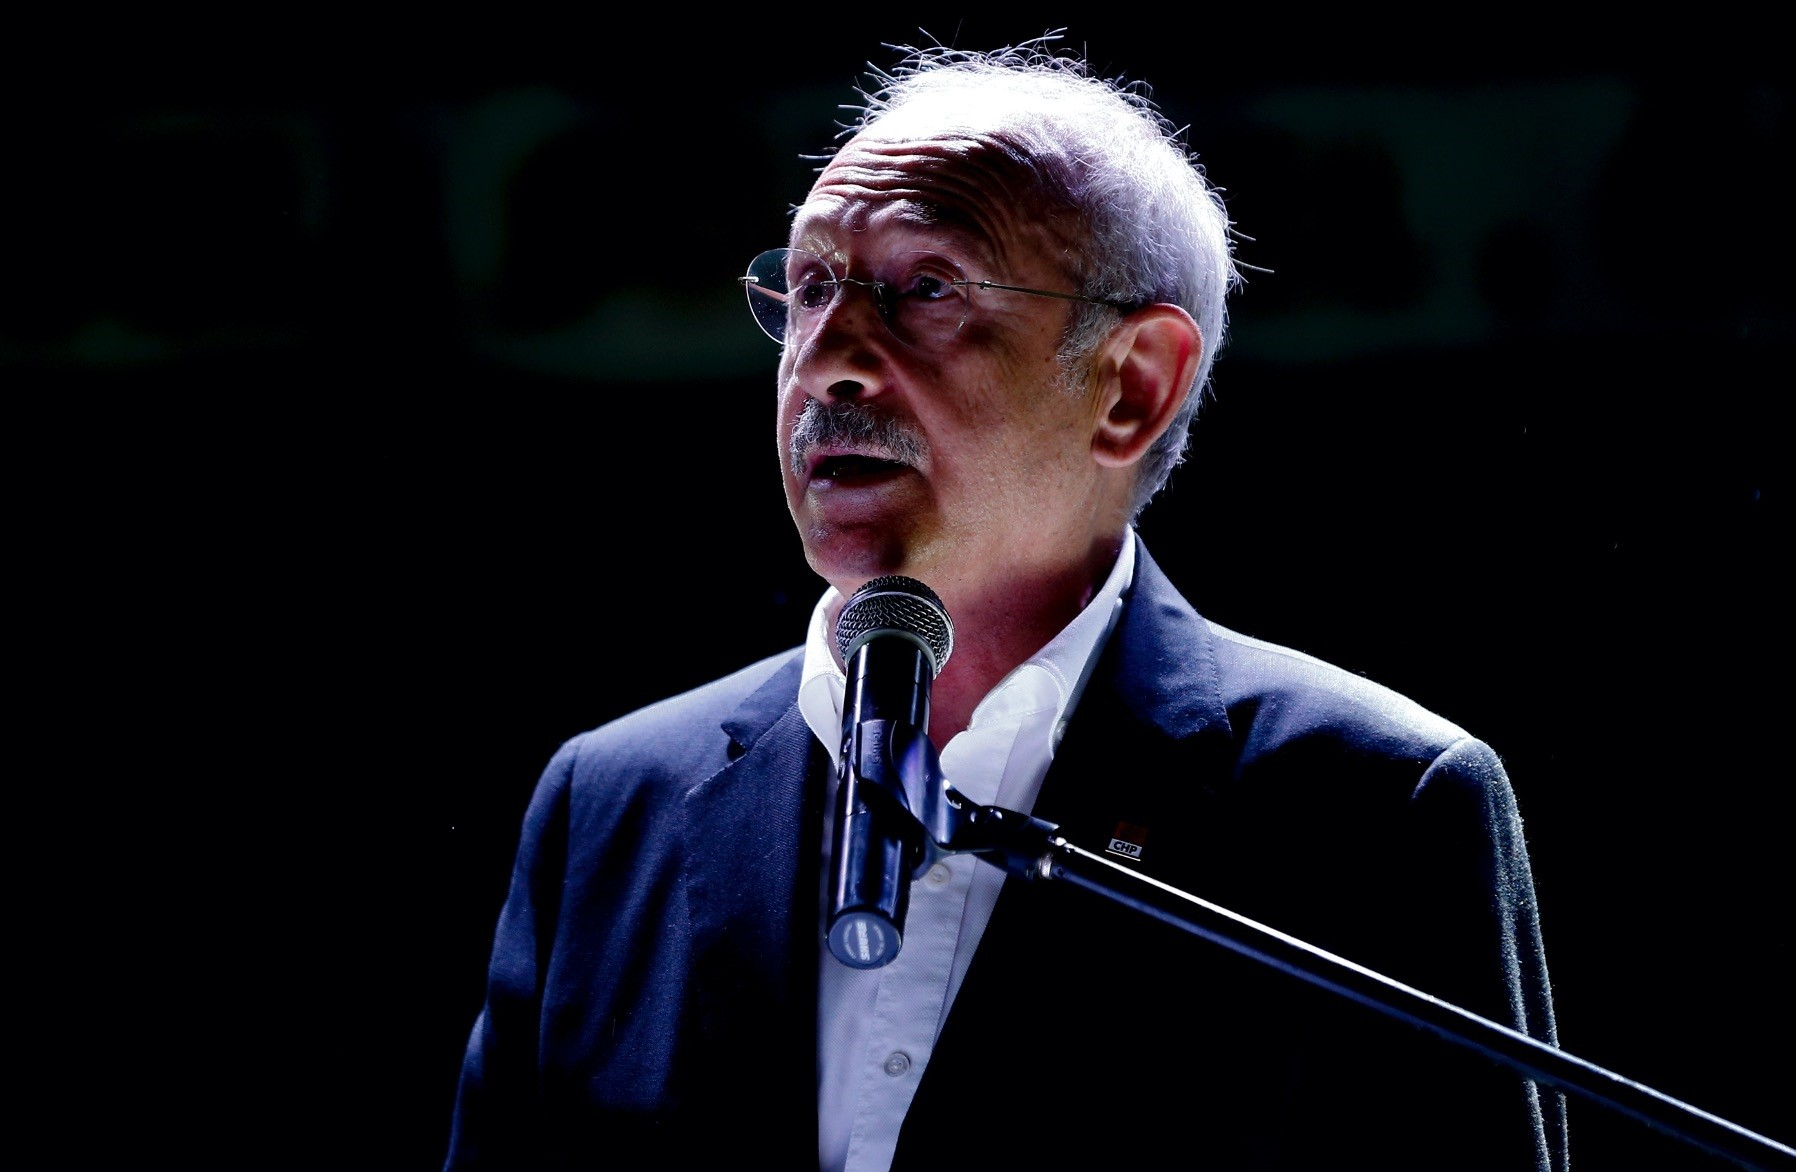 CHP Chairman Kemal Ku0131lu0131u00e7darou011flu delivering a speech in southern Antalya province, July 21.